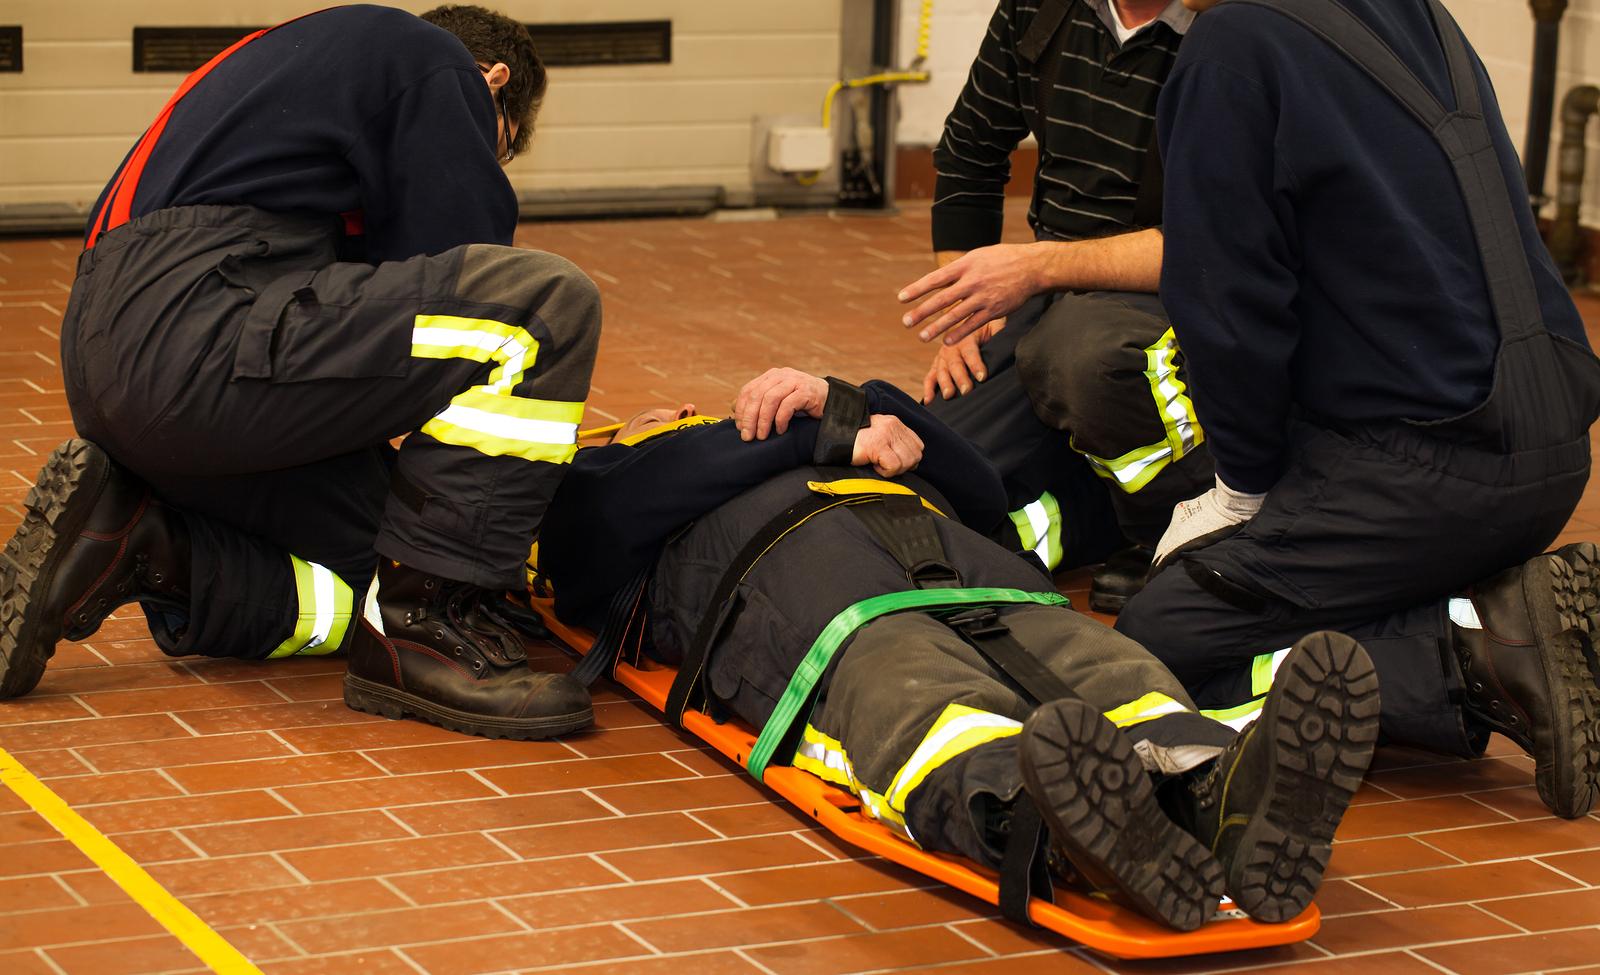 Firefighters-Stretcher1.jpg